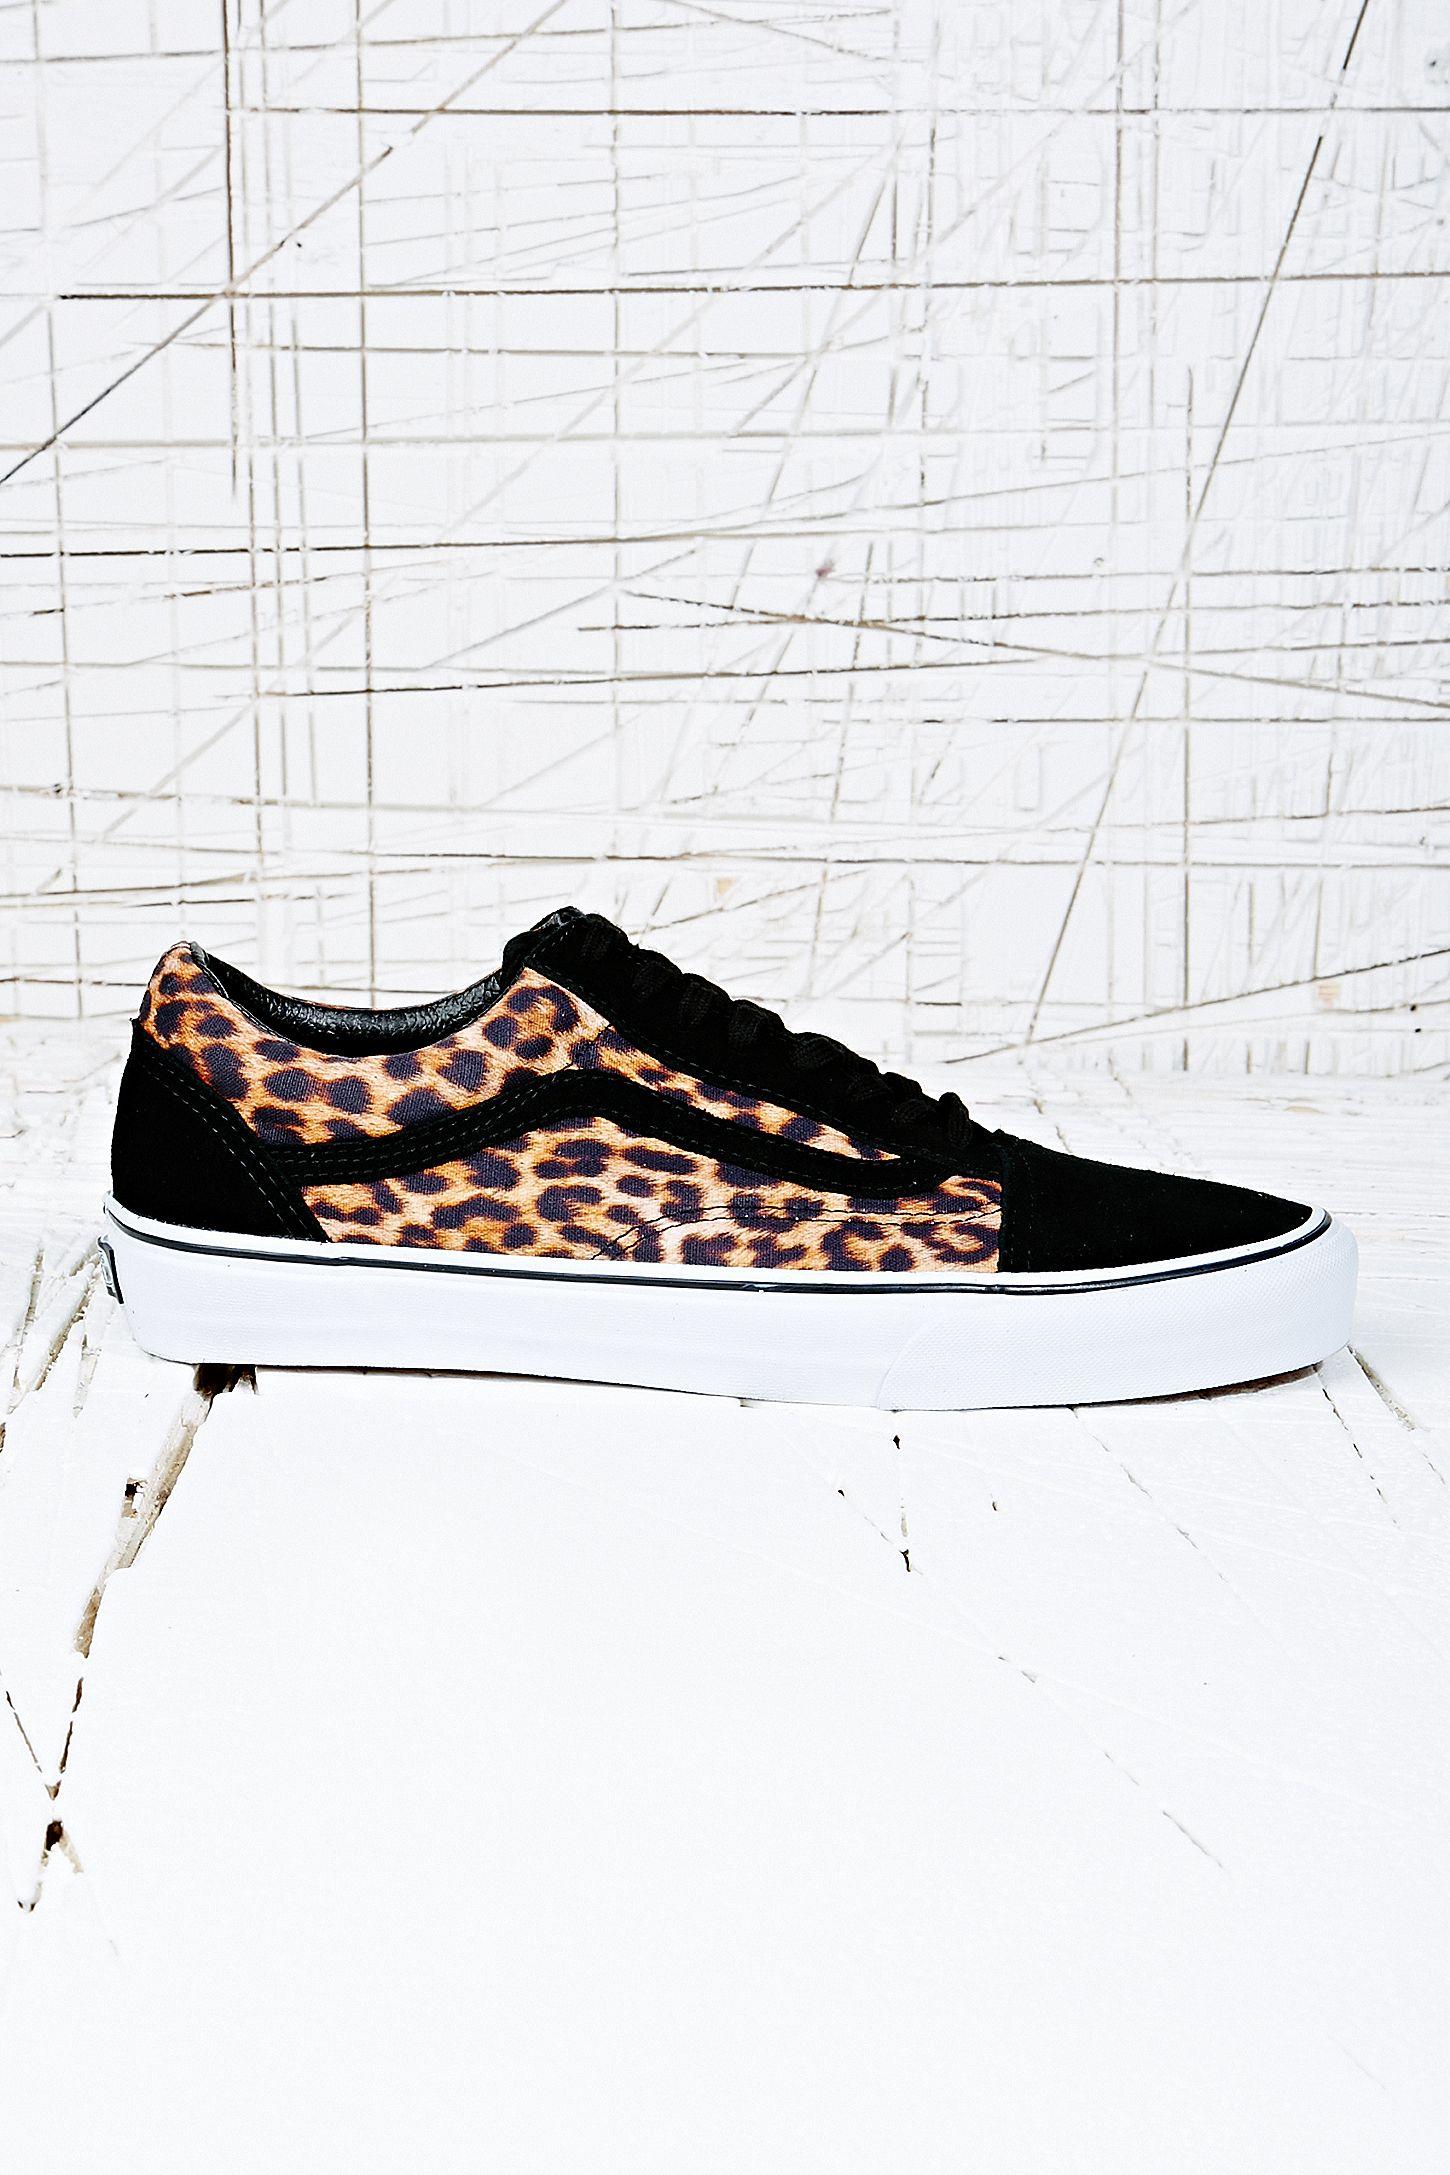 Vans Old Skool Suede Trainers in Leopard Print  380c9e4a4c0e